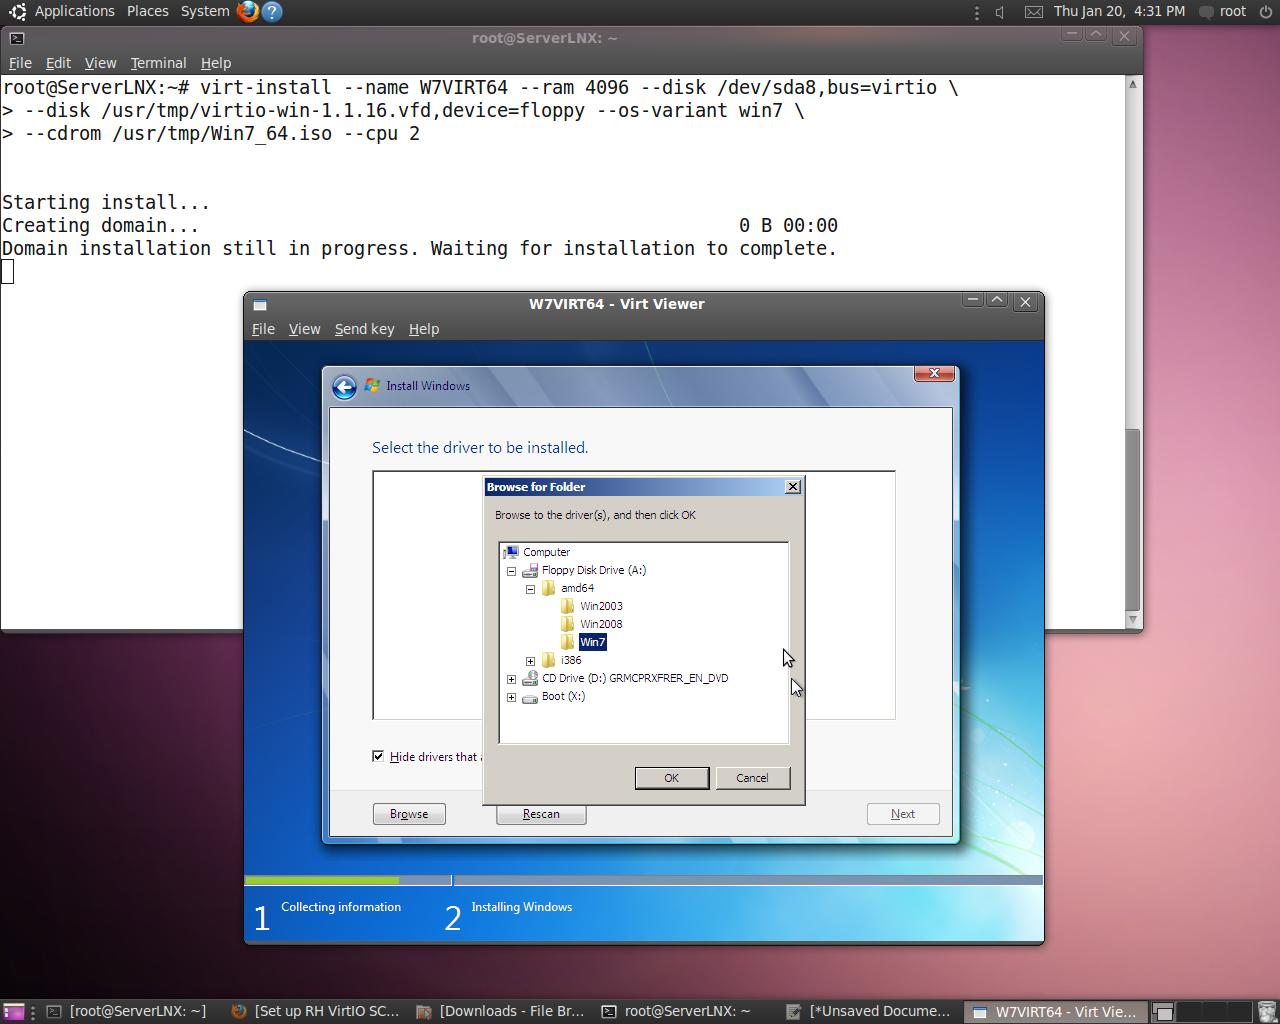 Virtio install Windows 7 KVM (x64/x86) on Ubuntu 10 04 1 Server via